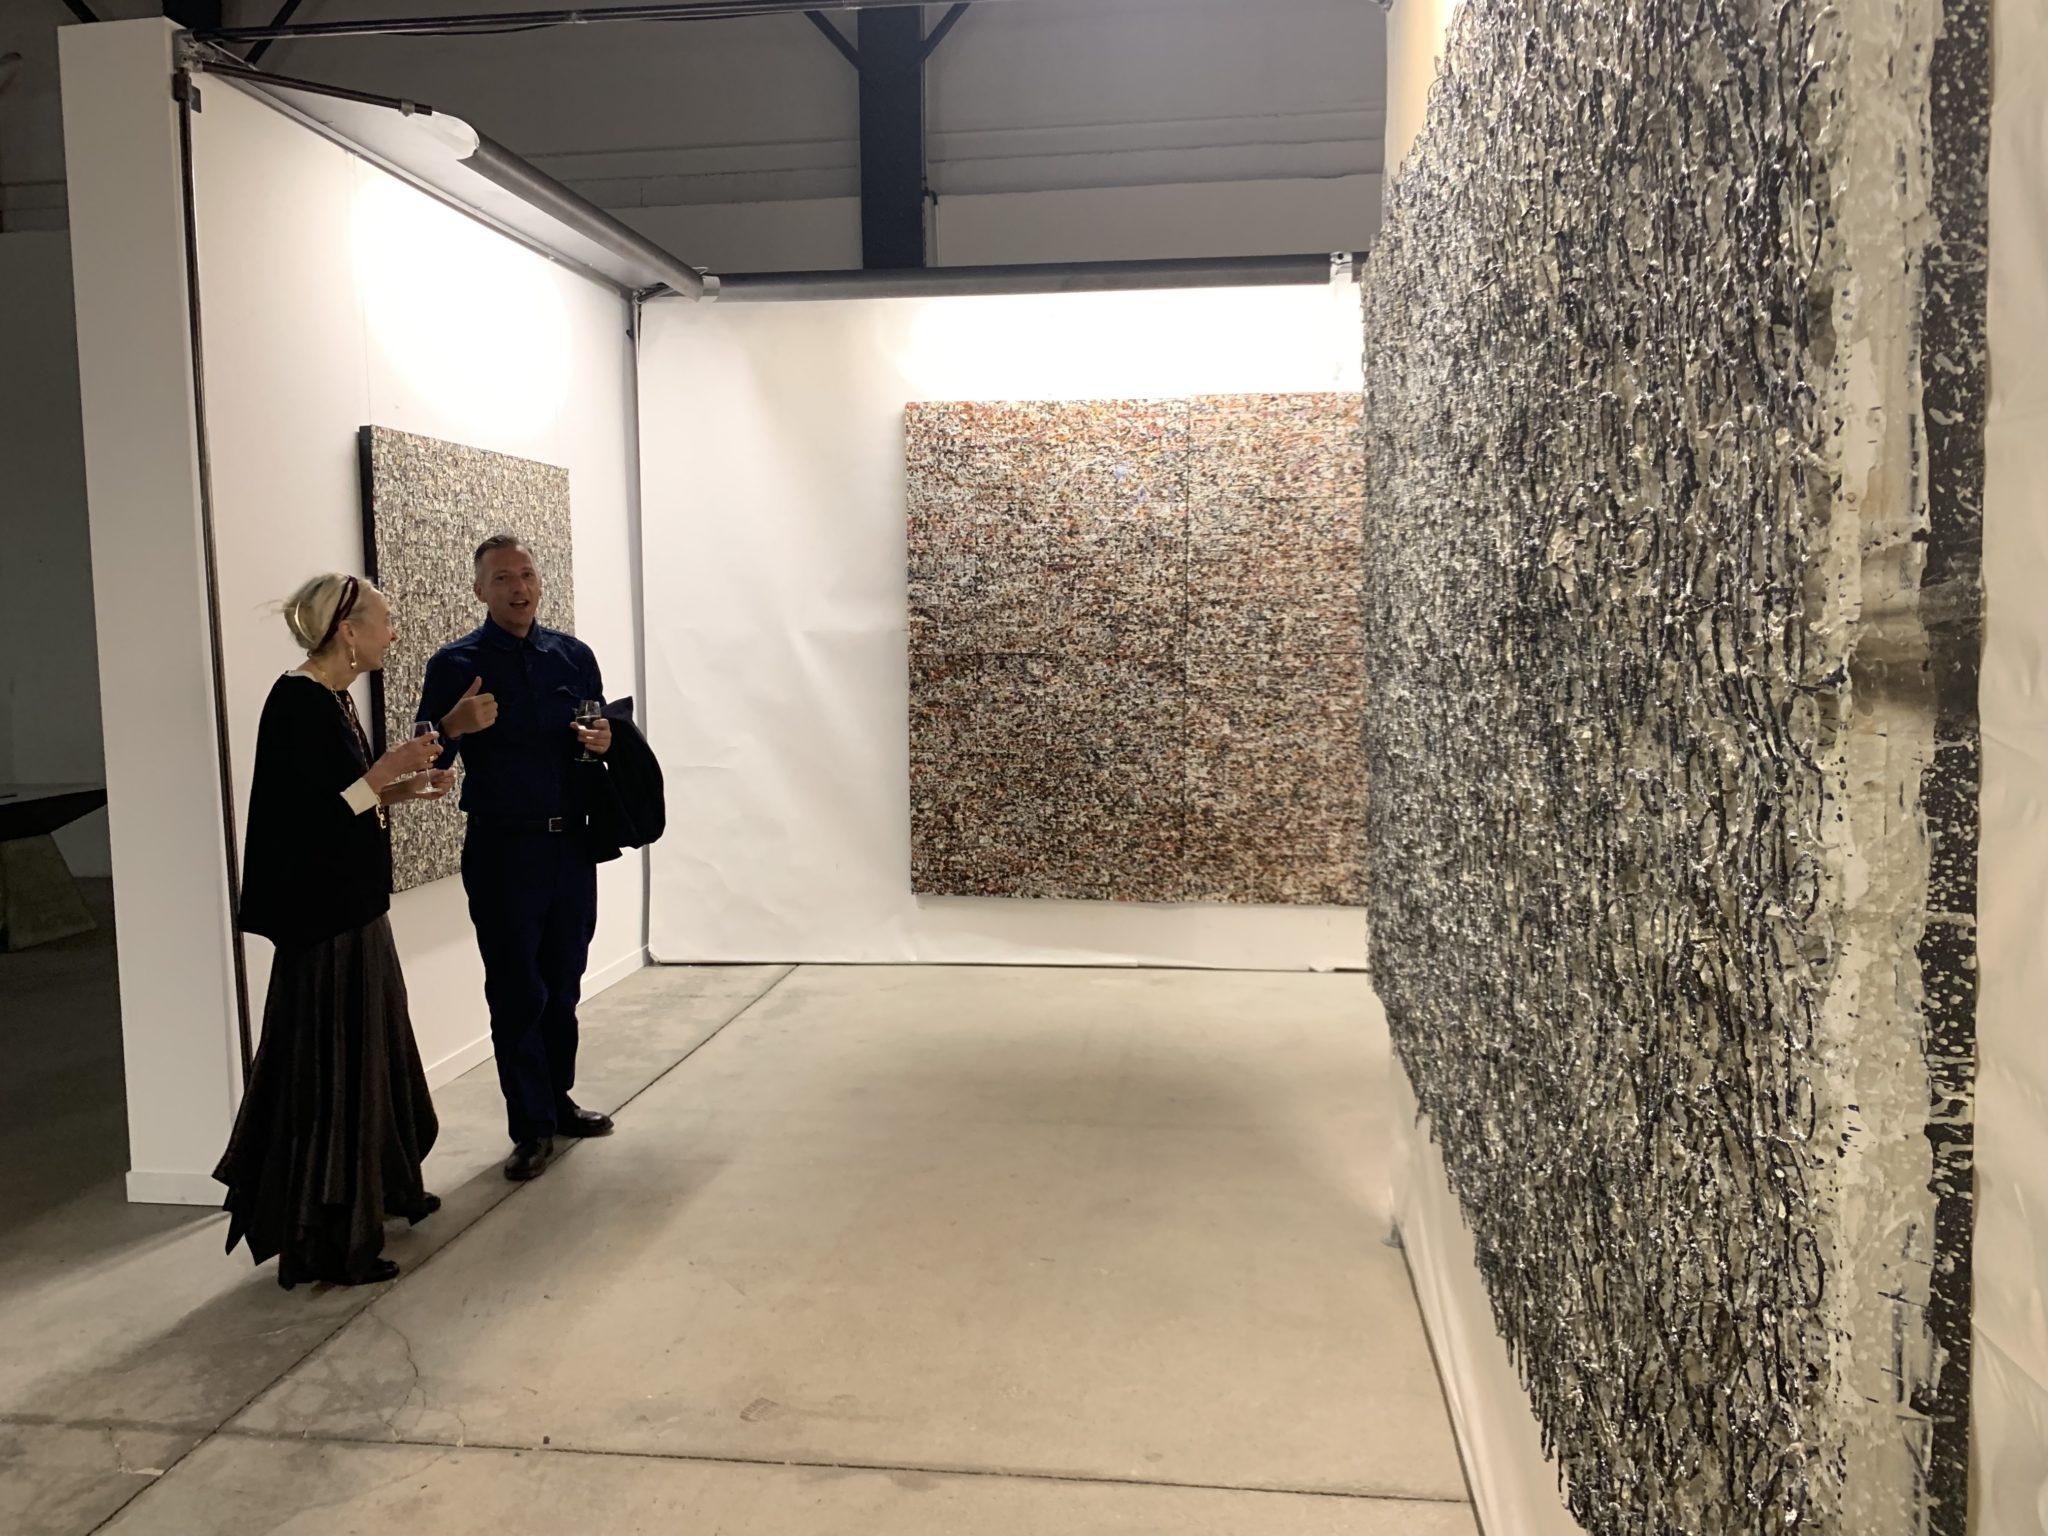 Carla Sozzani, Fondation Sozzani, Exposition Kris Ruhs, courtesy ARTVISIONS